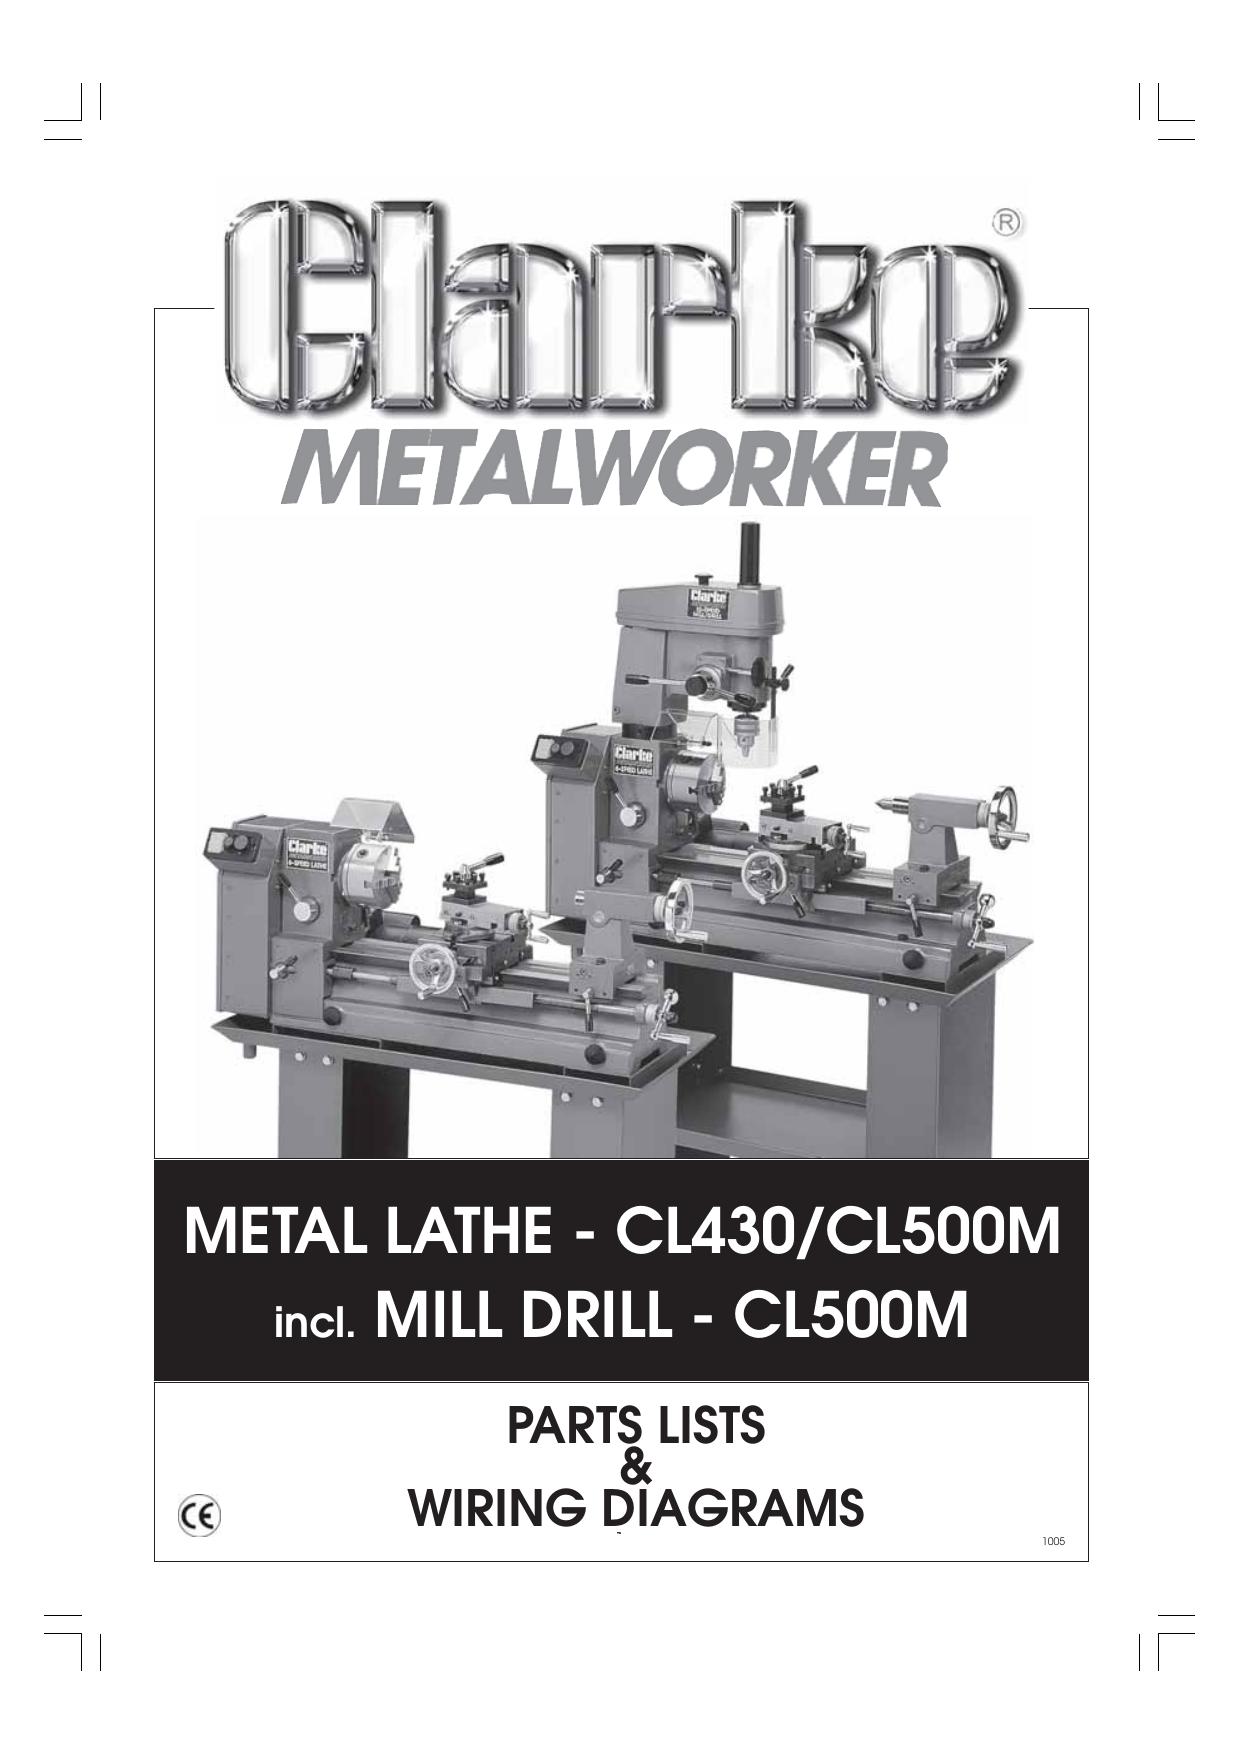 Metal Lathe Wiring Diagram   New Wiring Resources 2019 on